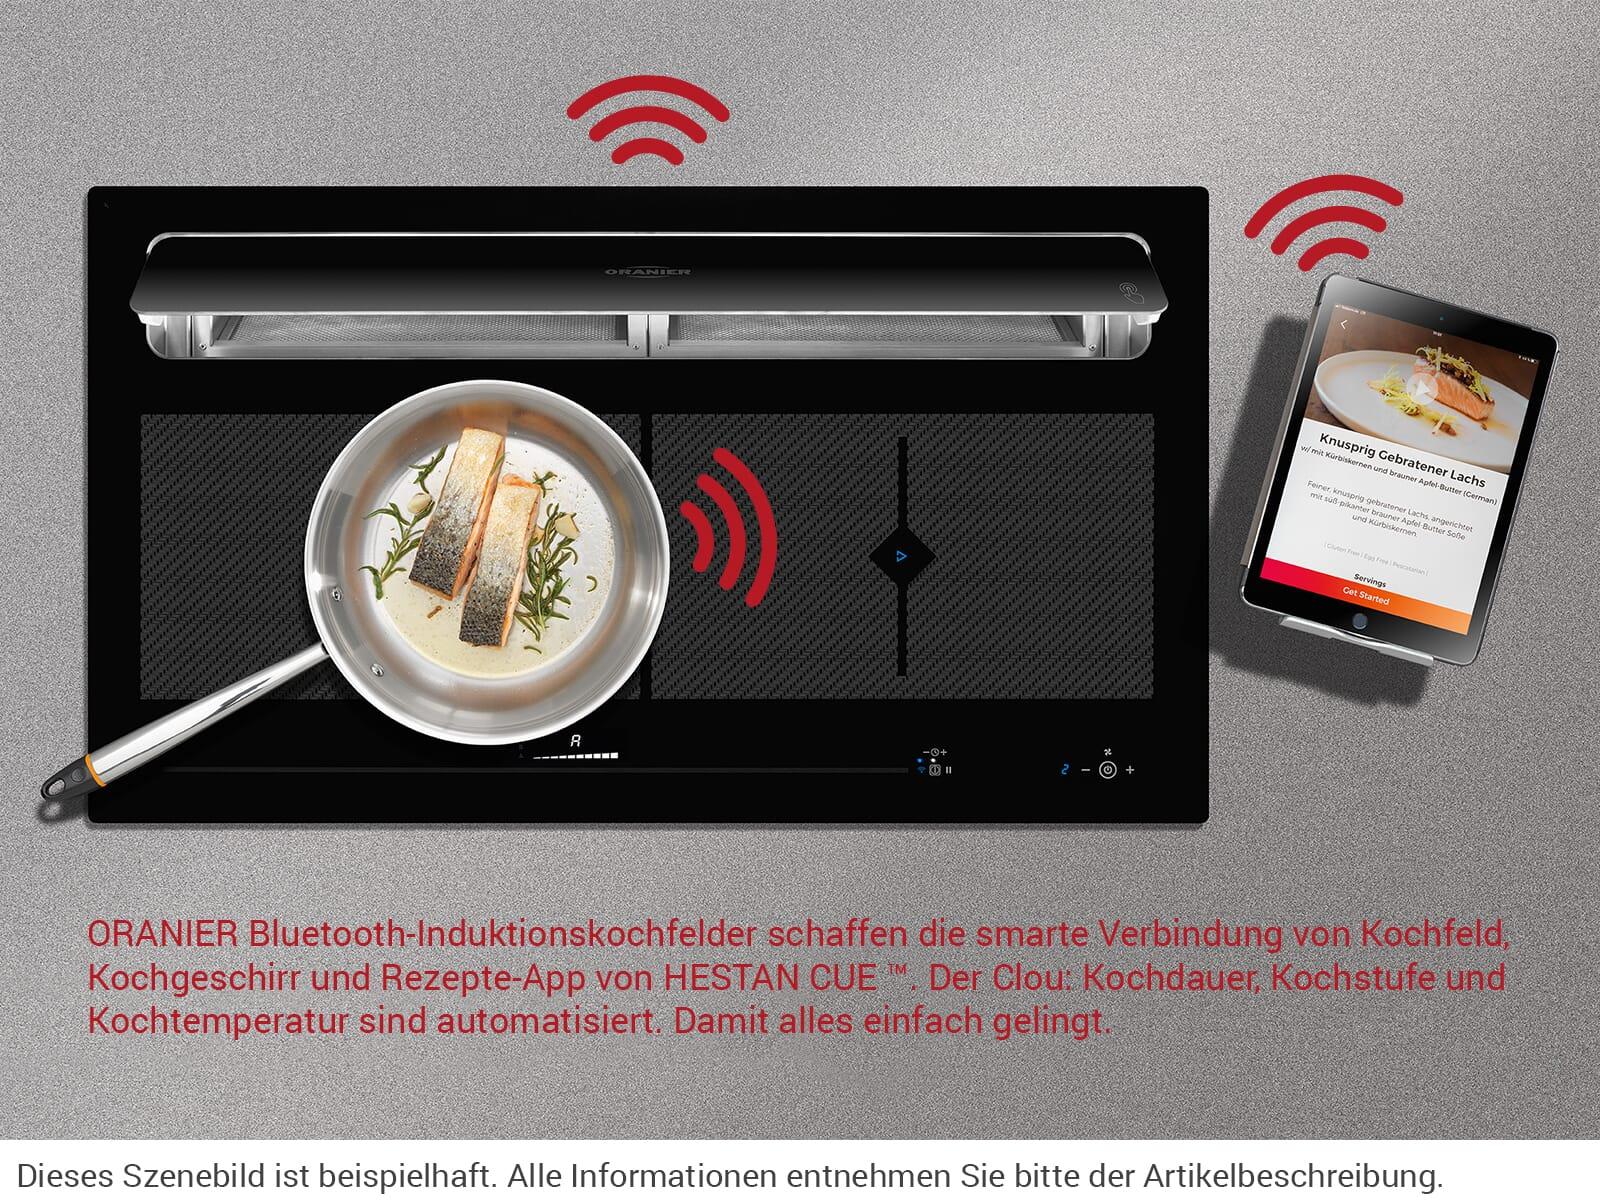 Oranier KFL 2094 be-cook - 2094 56 Induktionskochfeld-Dunstabzug-Kombination Abluft